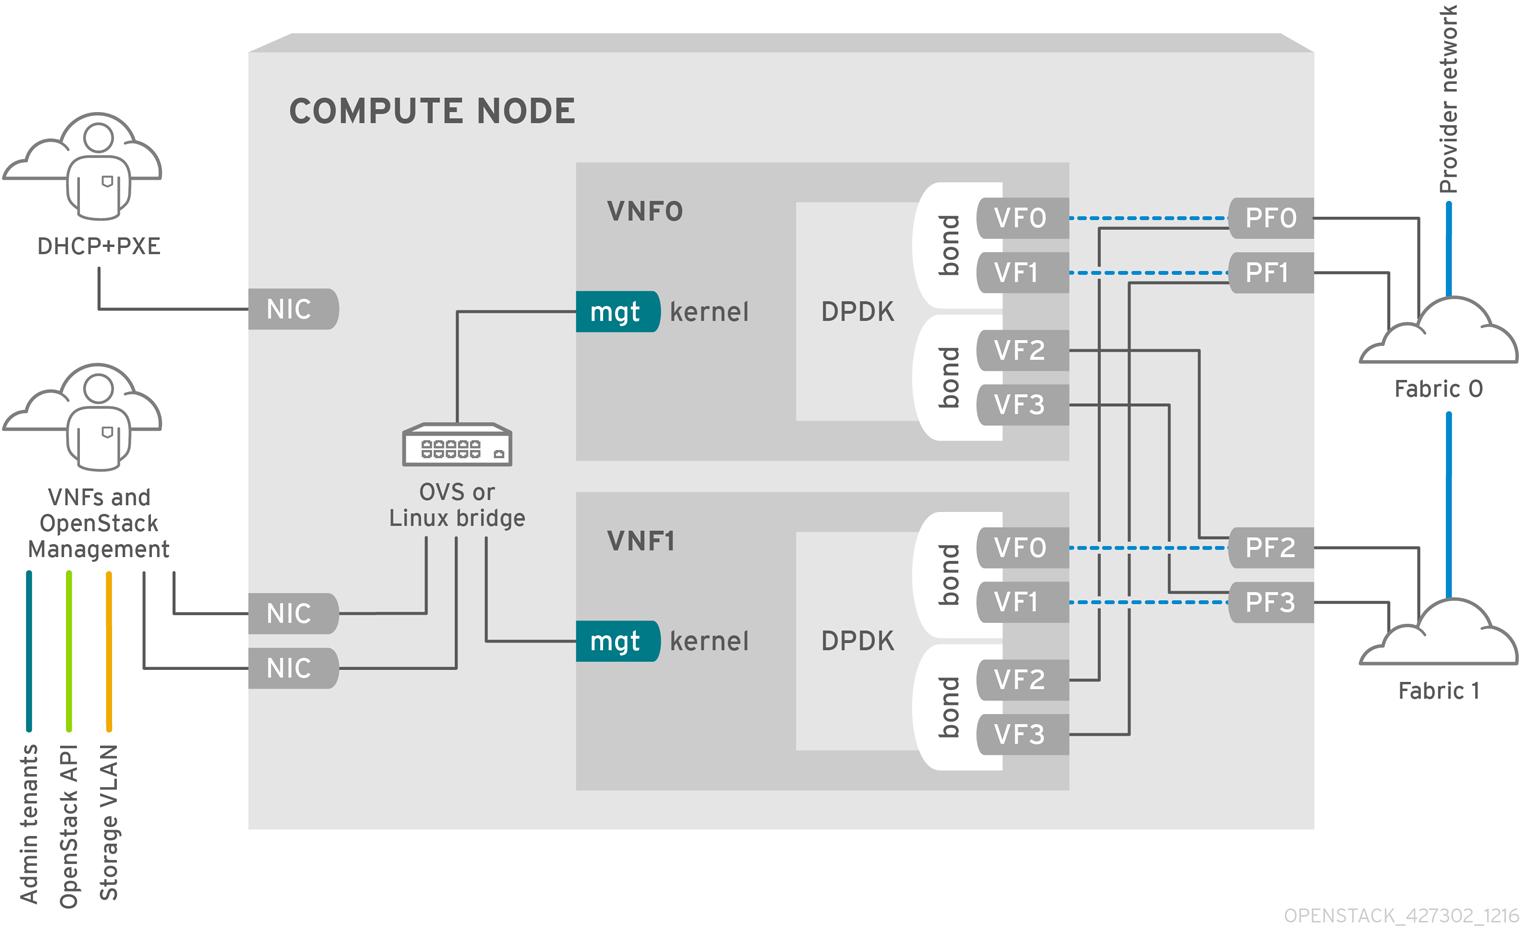 NFV SR-IOV deployment